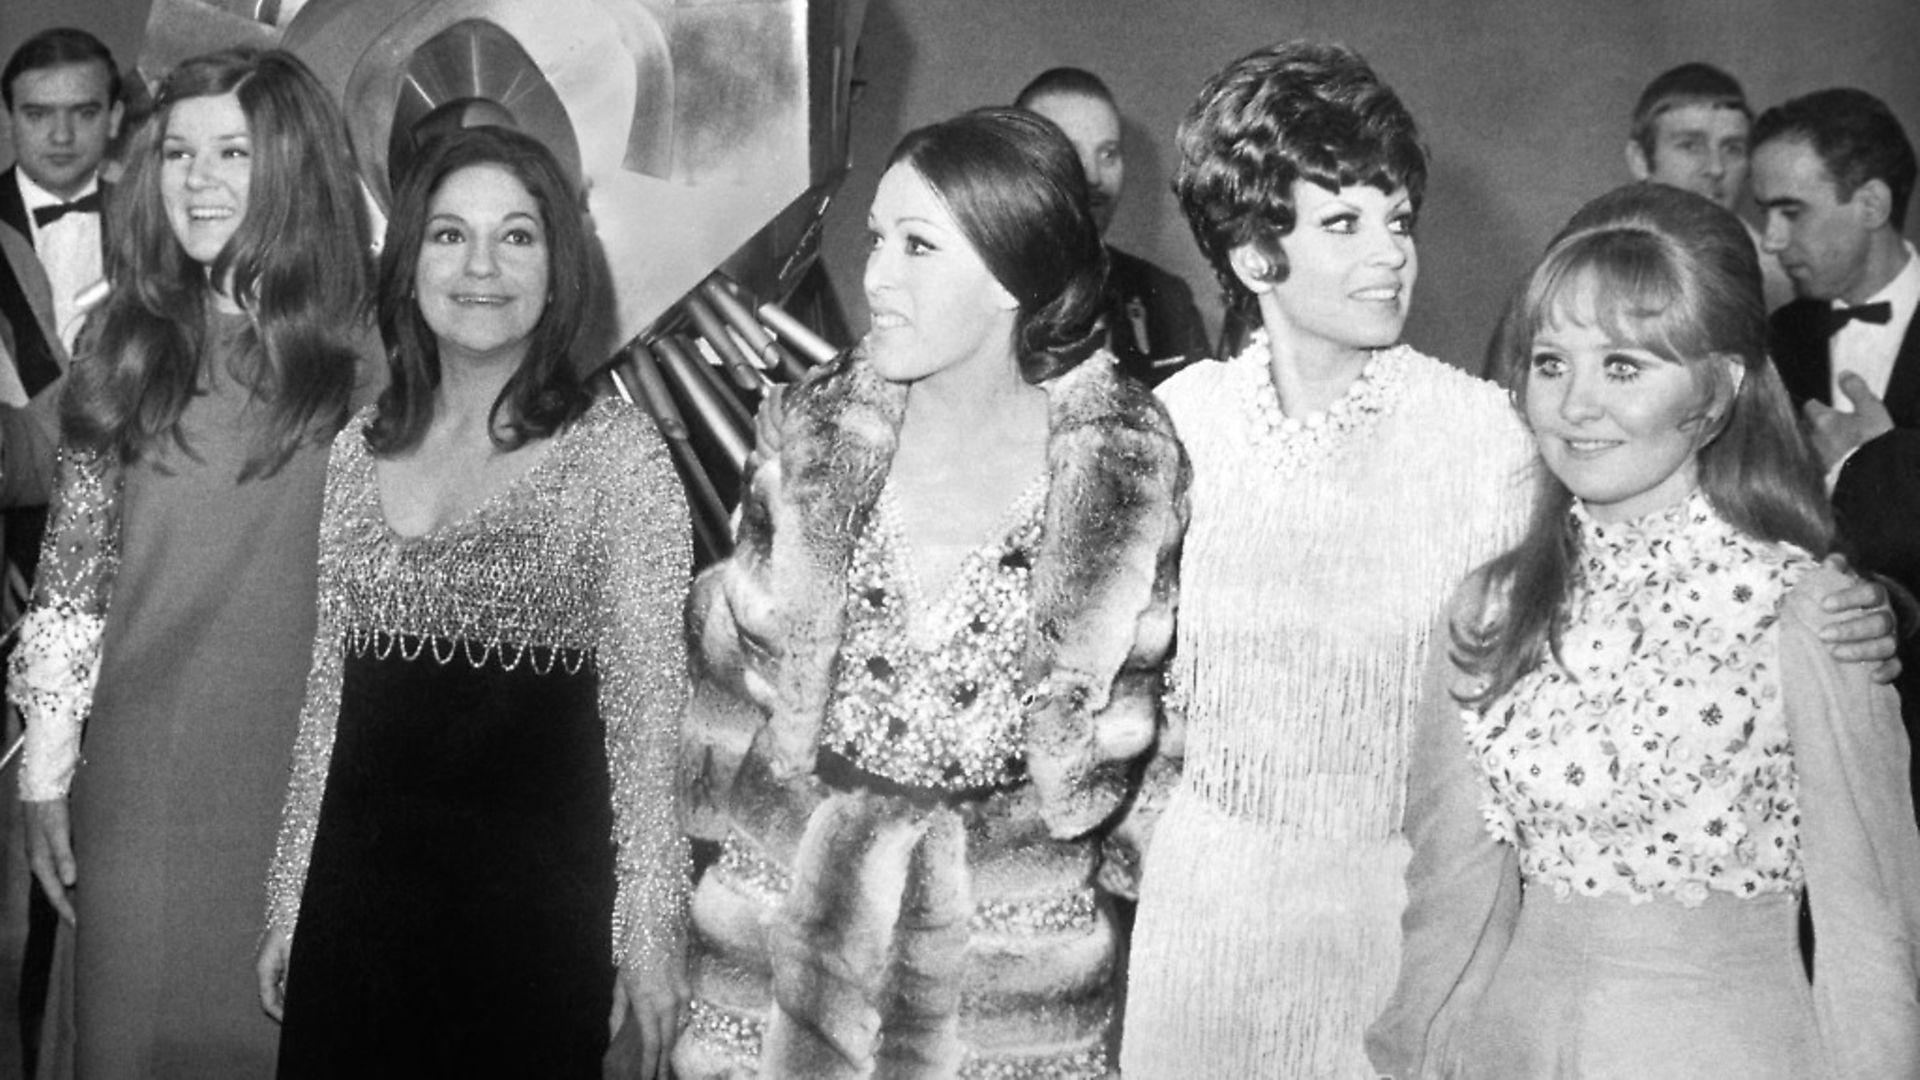 The 1969 Eurovision Song Contest winners with Spain's 1968 victor Massiel. From left, Lenny Kuhr (Netherlands), Frida Boccara (France), Massiel Salome (Spain) and Lulu (UK) Photo: Hans J. Hoffmann/ullstein bild via Getty Images - Credit: ullstein bild via Getty Images